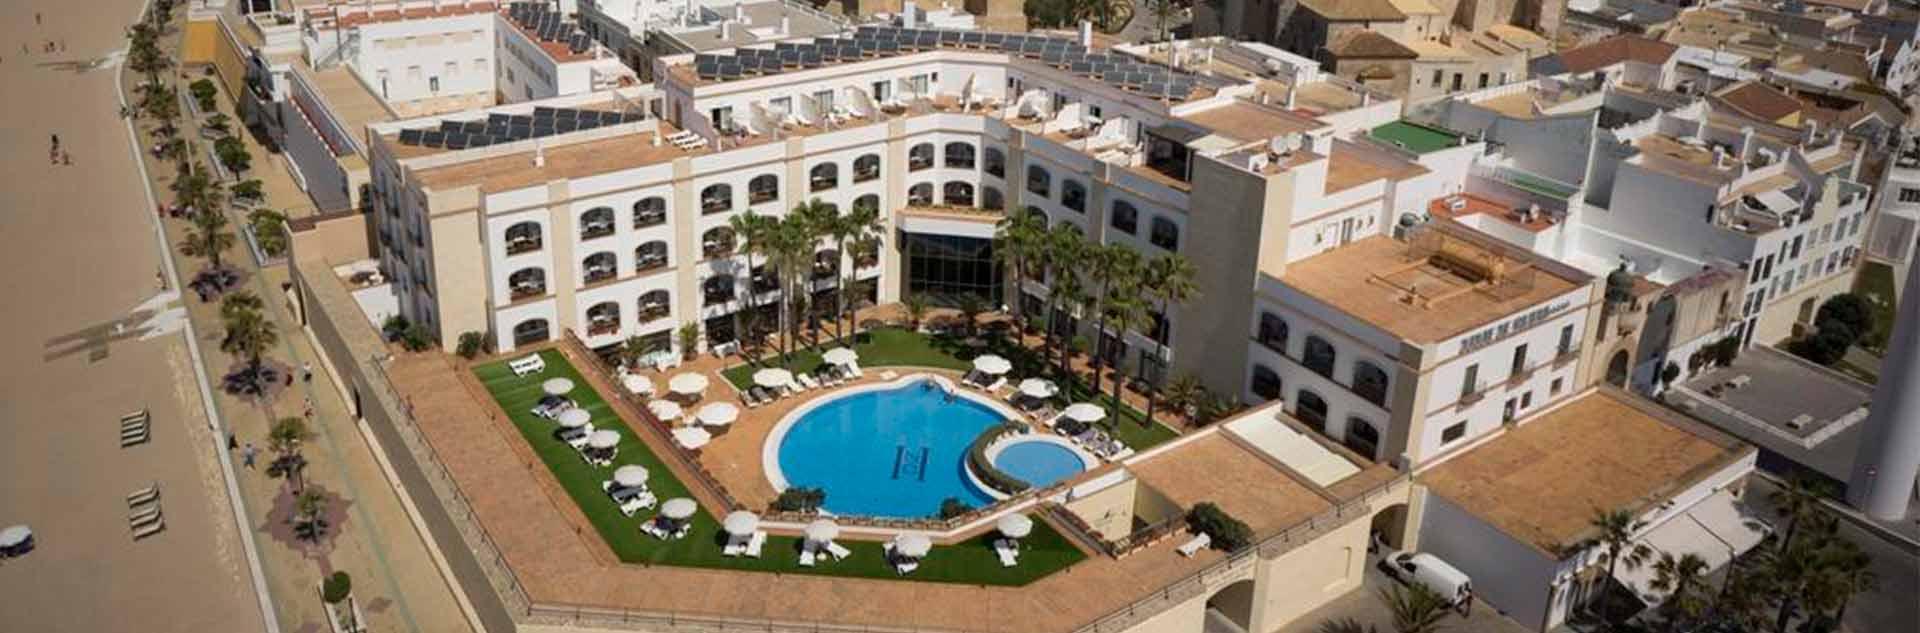 Hotel Duque de Nájera 4* vista aérea